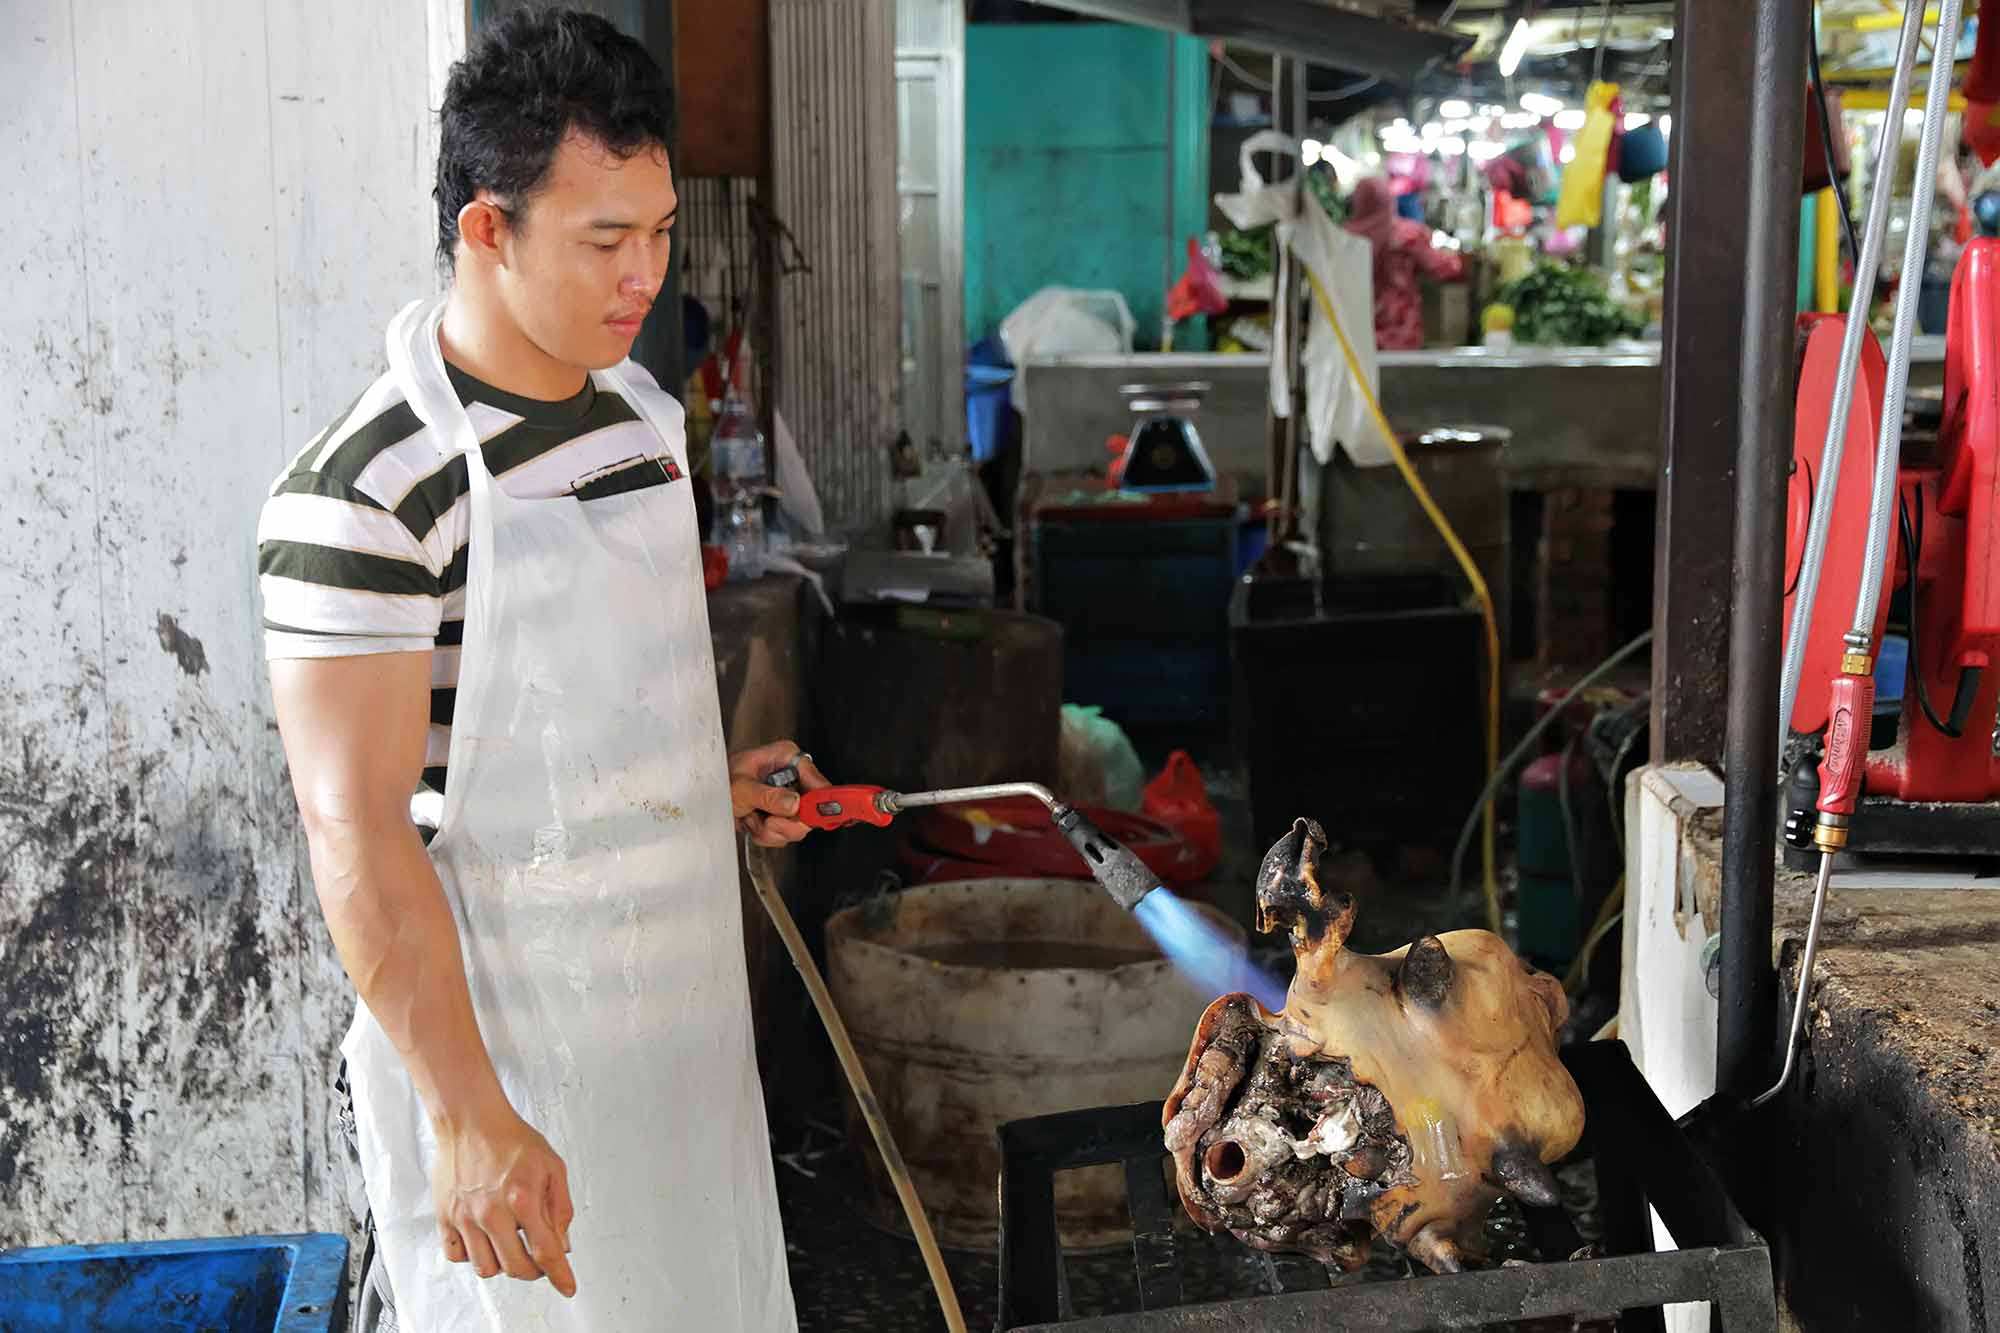 Meat market in Kuala Lumpur, Malaysia. © Ulli Maier & Nisa Maier